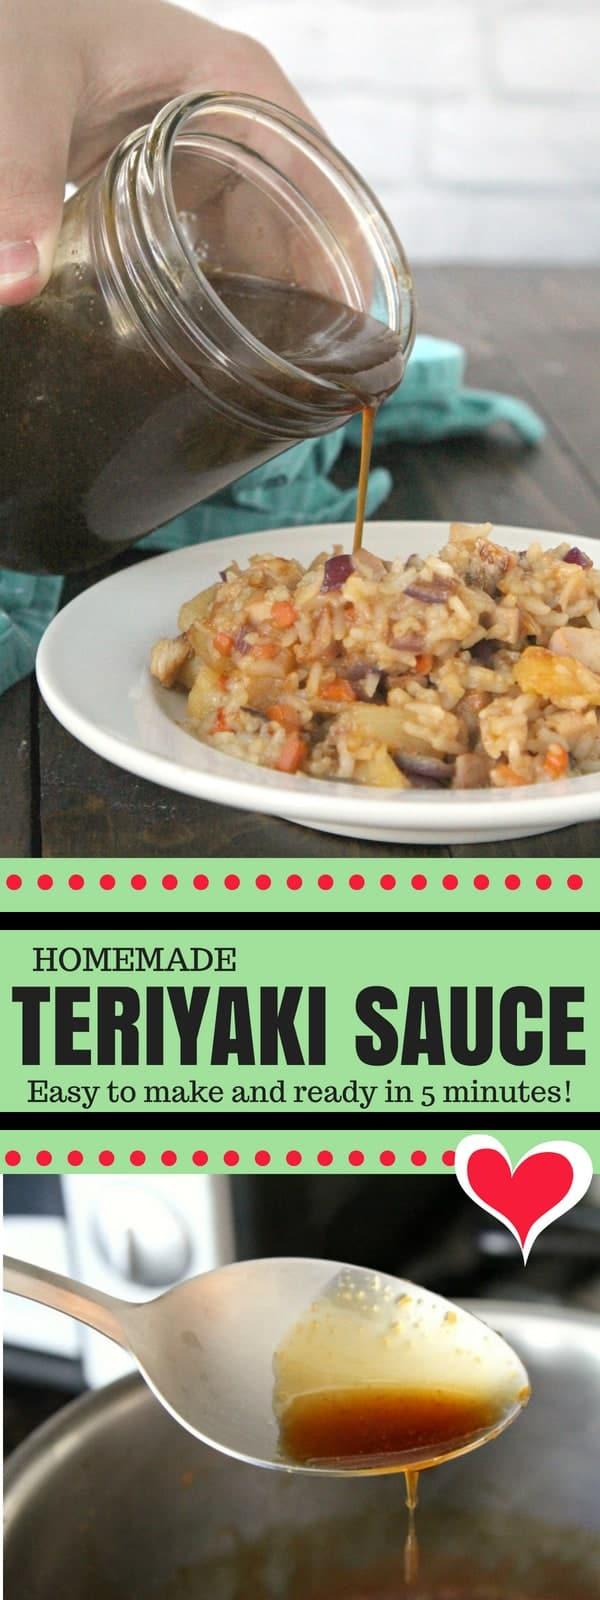 Homemade Teriyaki Sauce - easy homemade recipe and the best for grilled chicken, pork, beef (steak), burgers, stir-fries and more! #Recipe #Teriyaki #Asian #SnappyGourmet #Chicken #Steak #Easy #Homemade